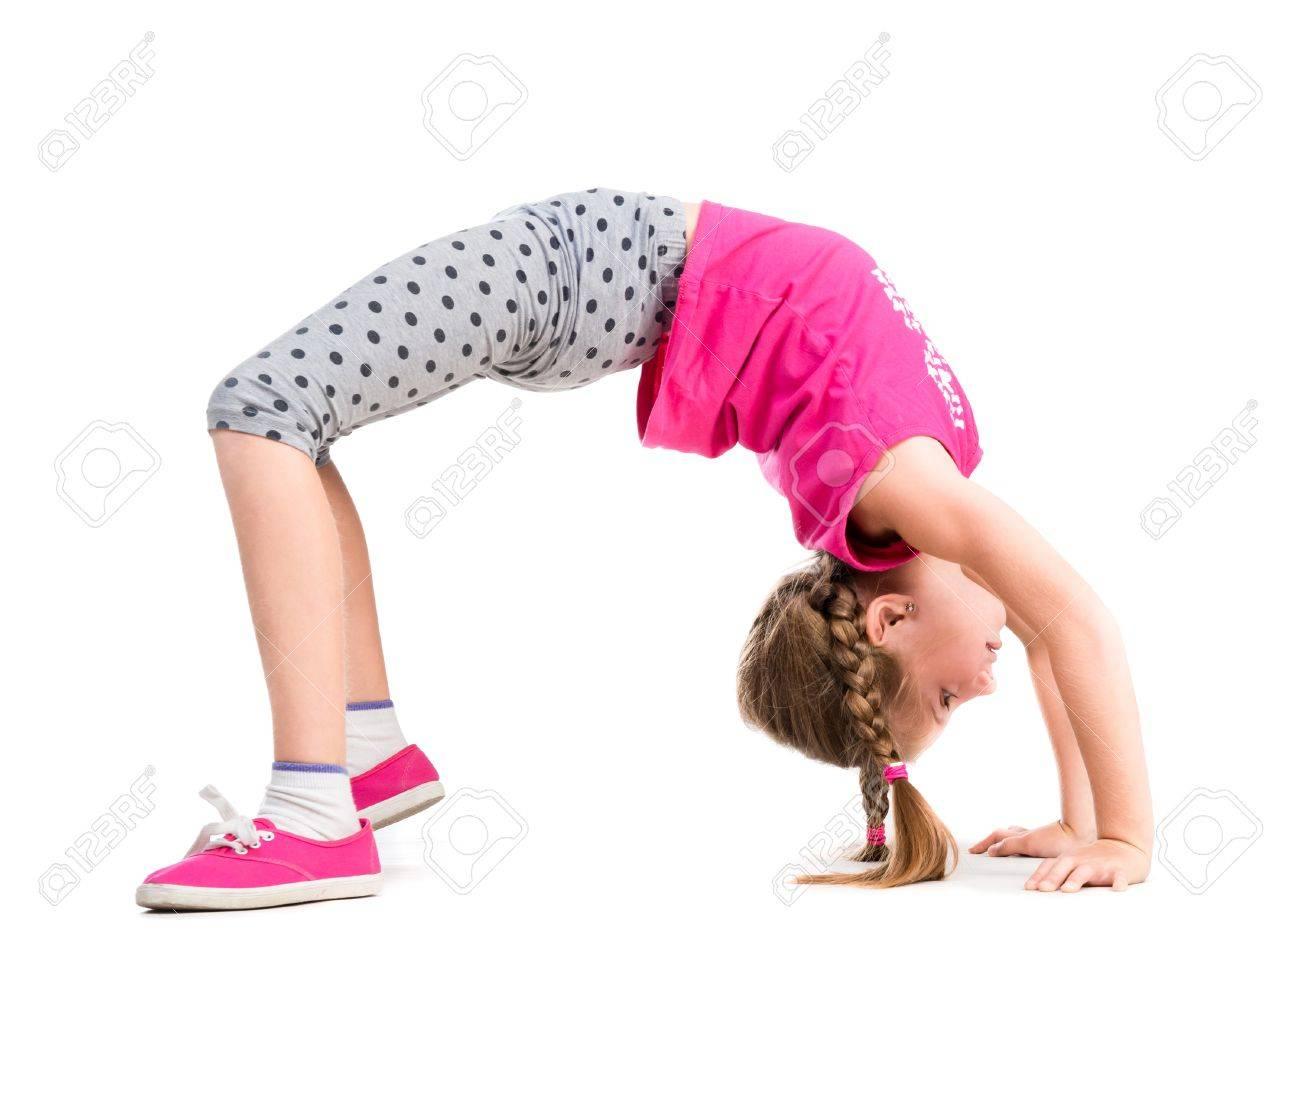 little girl doing the bridge exercise isolated on white background - 44481561